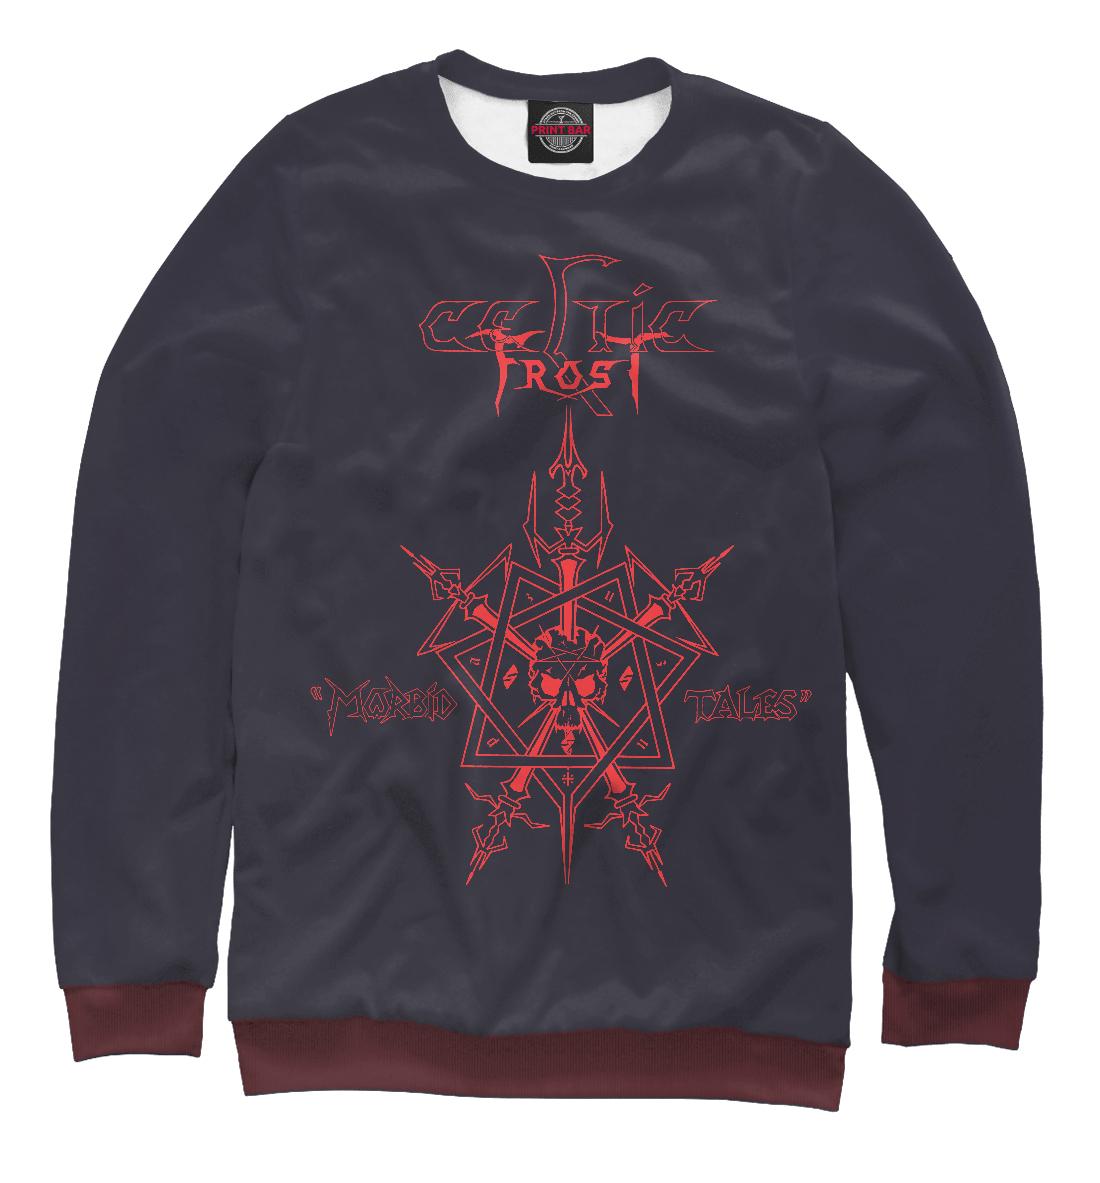 Купить Celtic Frost, Printbar, Свитшоты, MZK-242673-swi-1